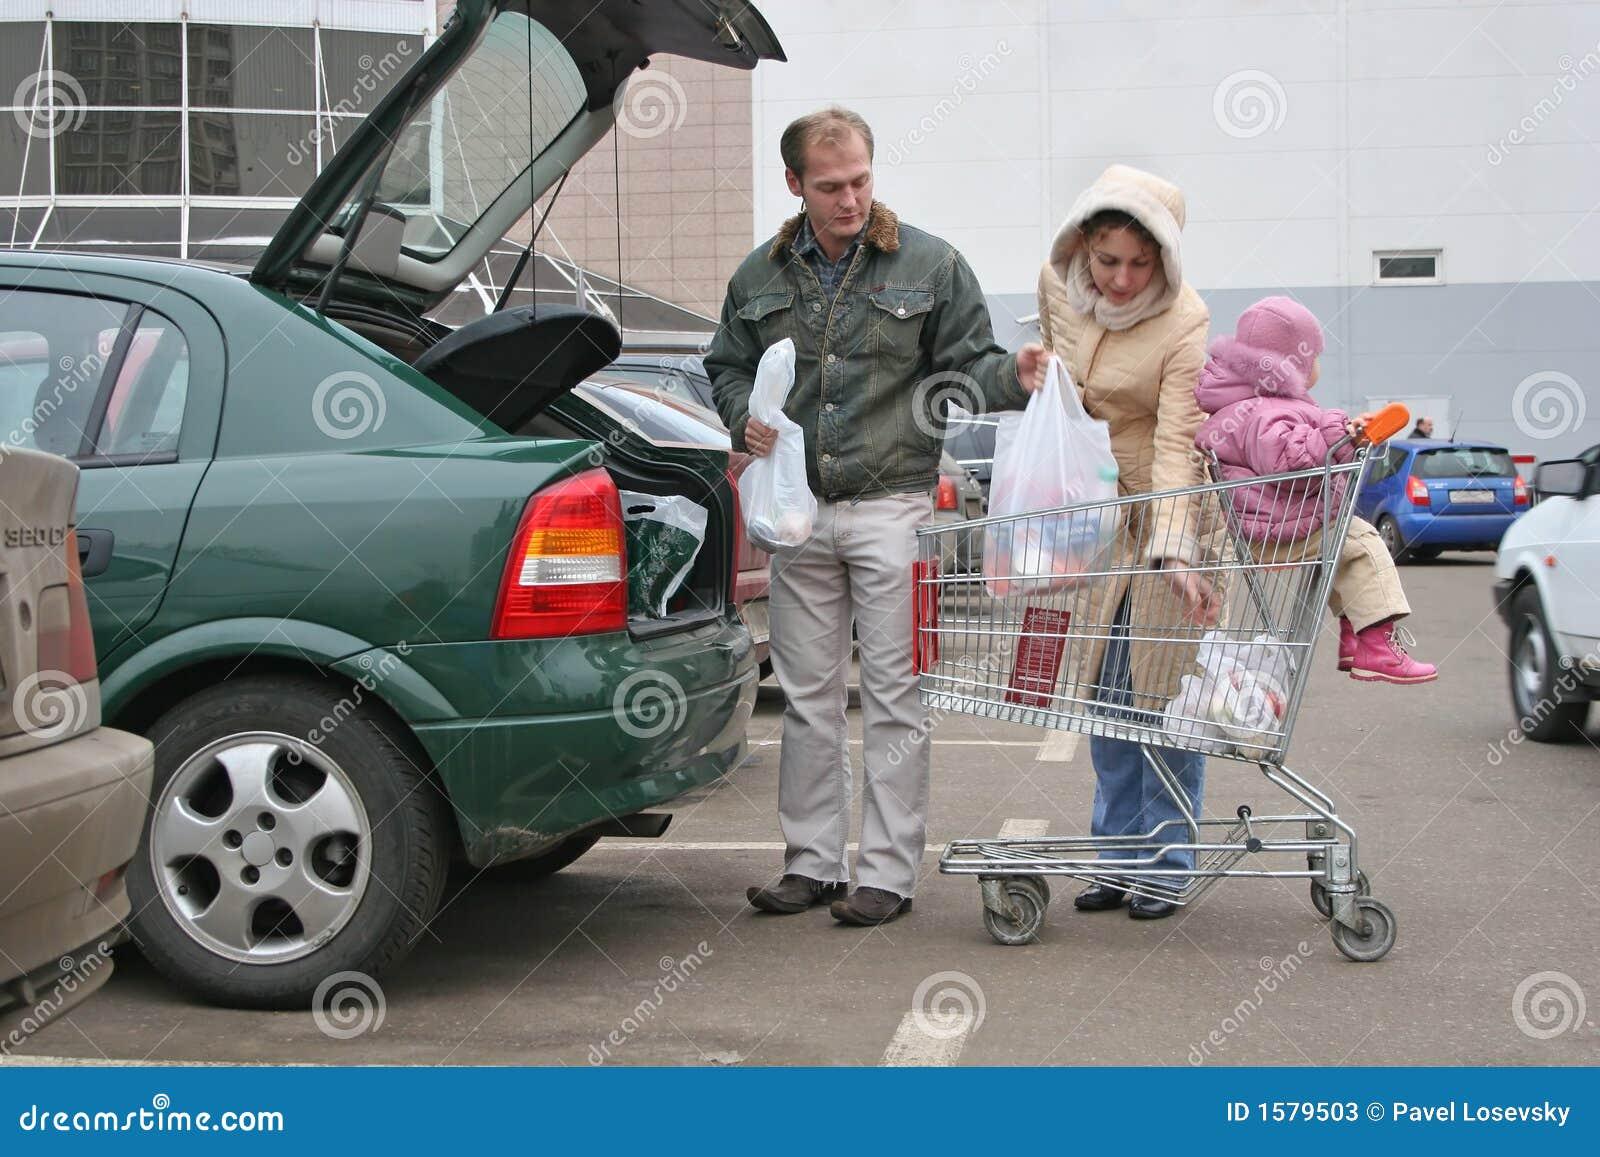 Family Puting Shopping Bags In Car Stock Photos Image 1579503